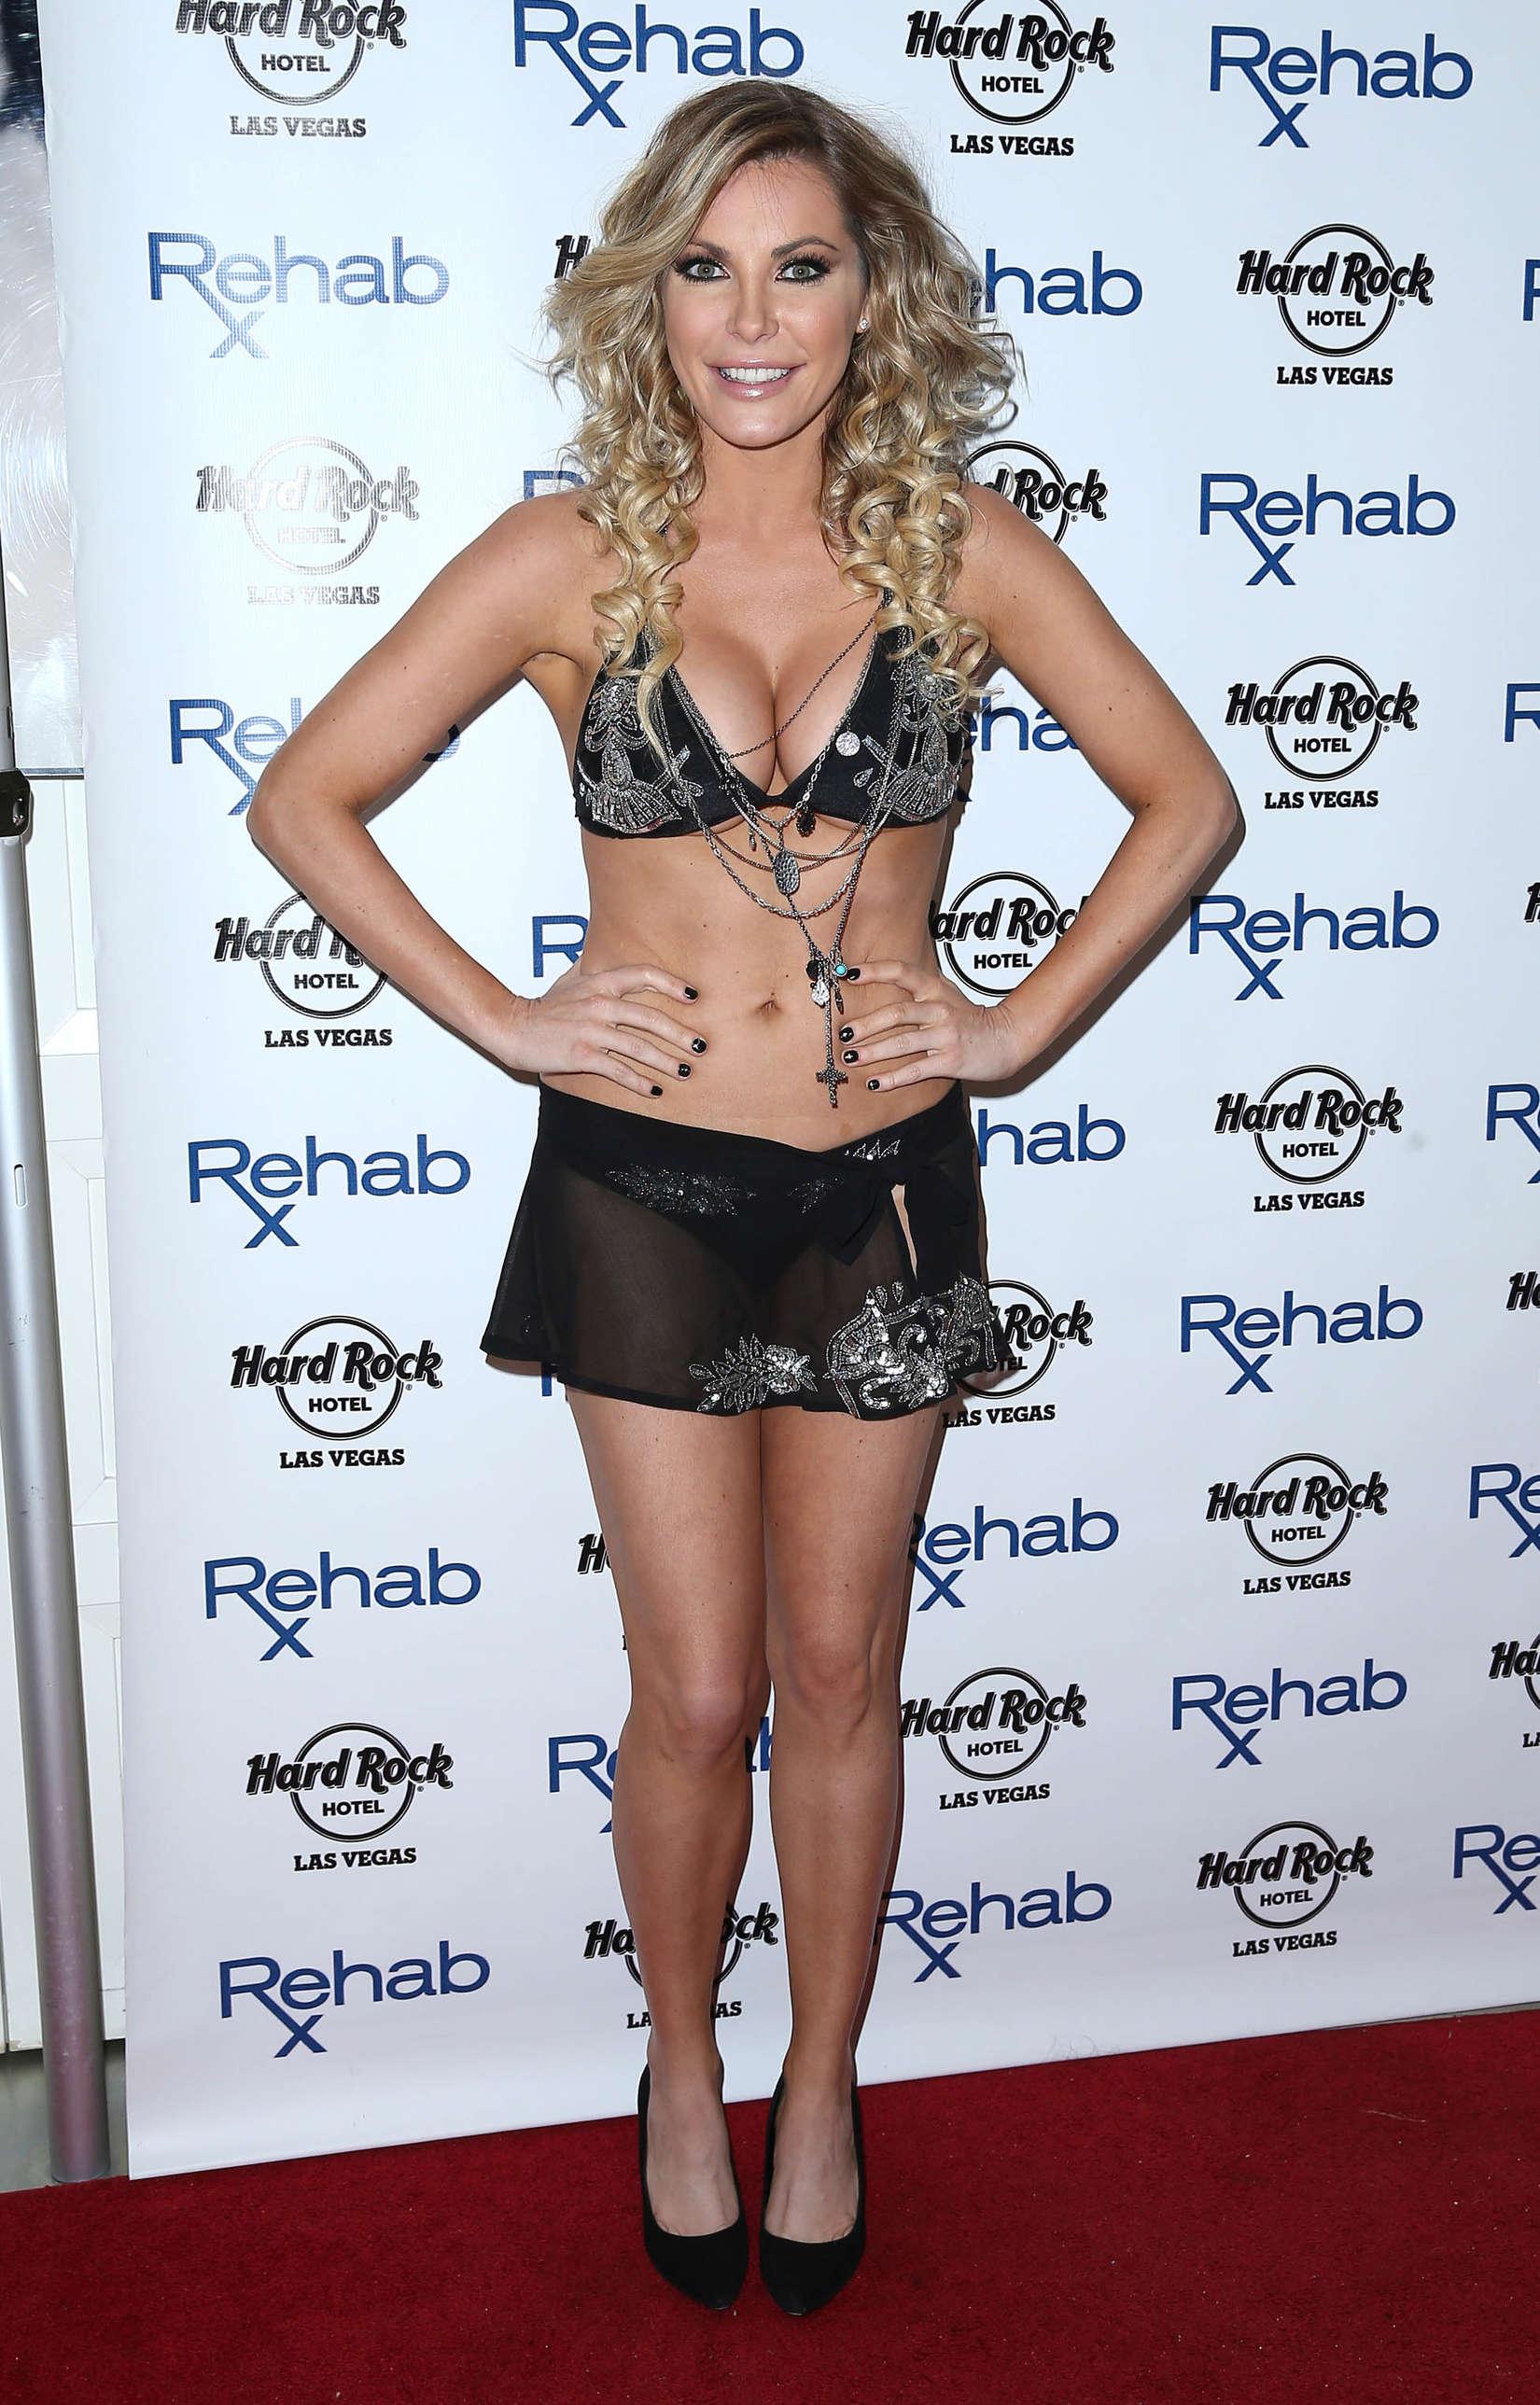 Fotos Crystal Hefner nudes (82 foto and video), Tits, Sideboobs, Feet, butt 2020